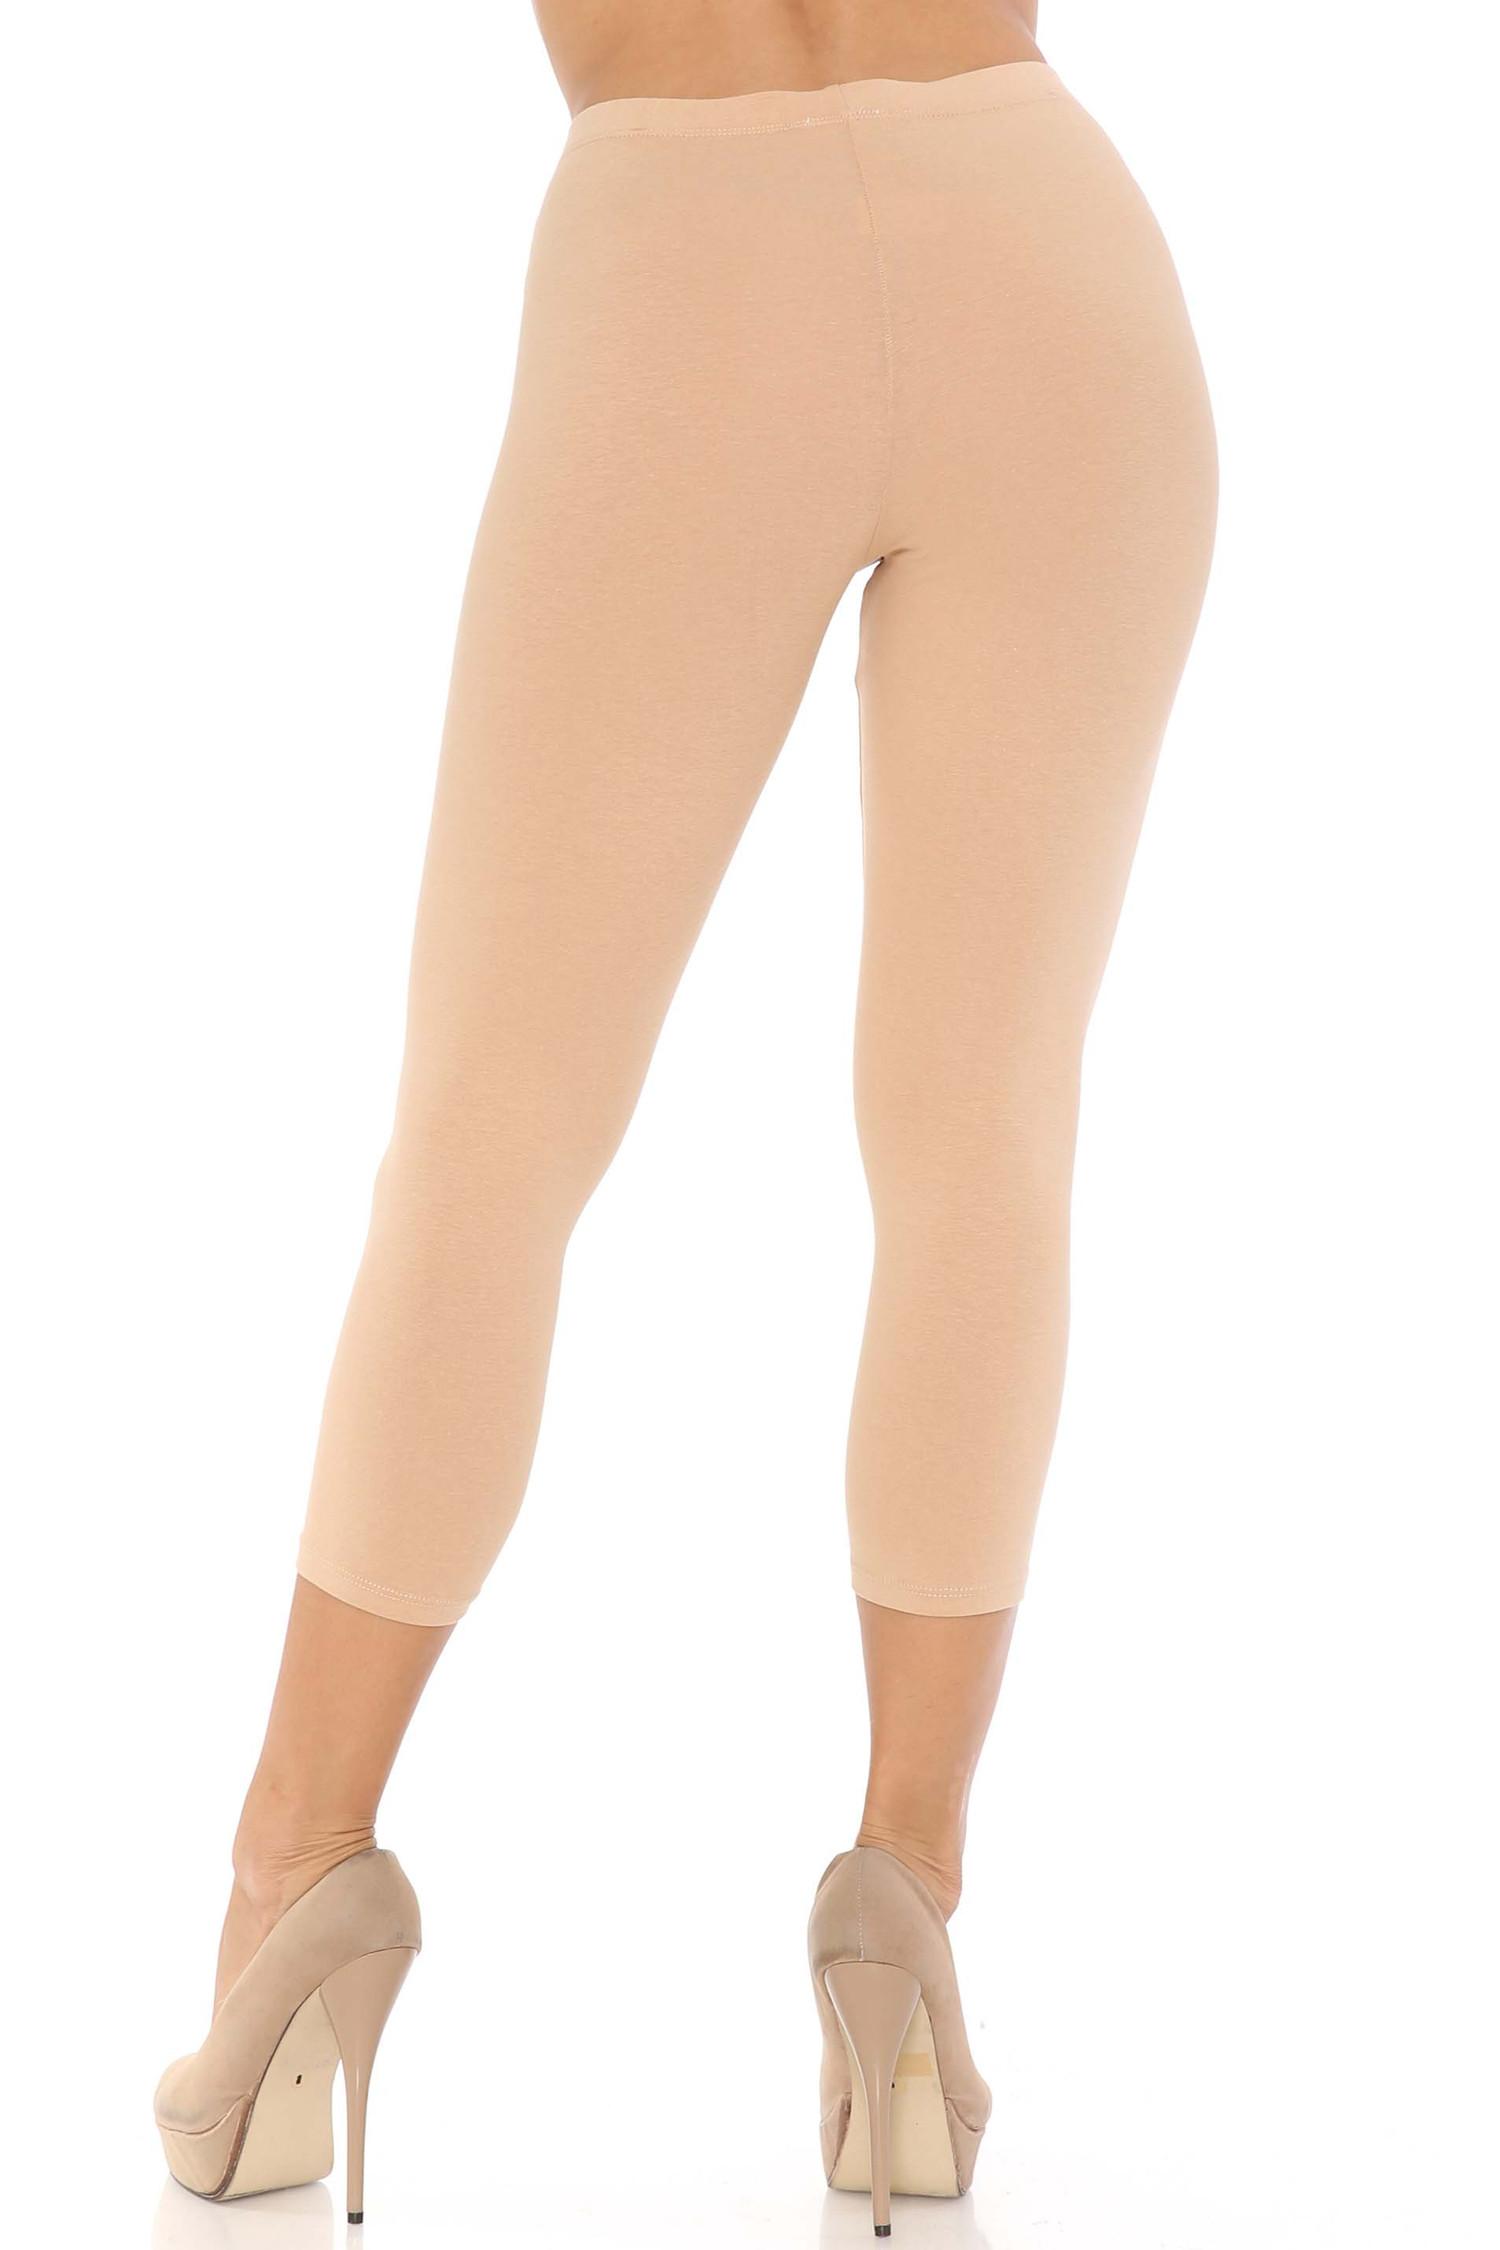 Rear view of beige USA Cotton Capri Length Leggings